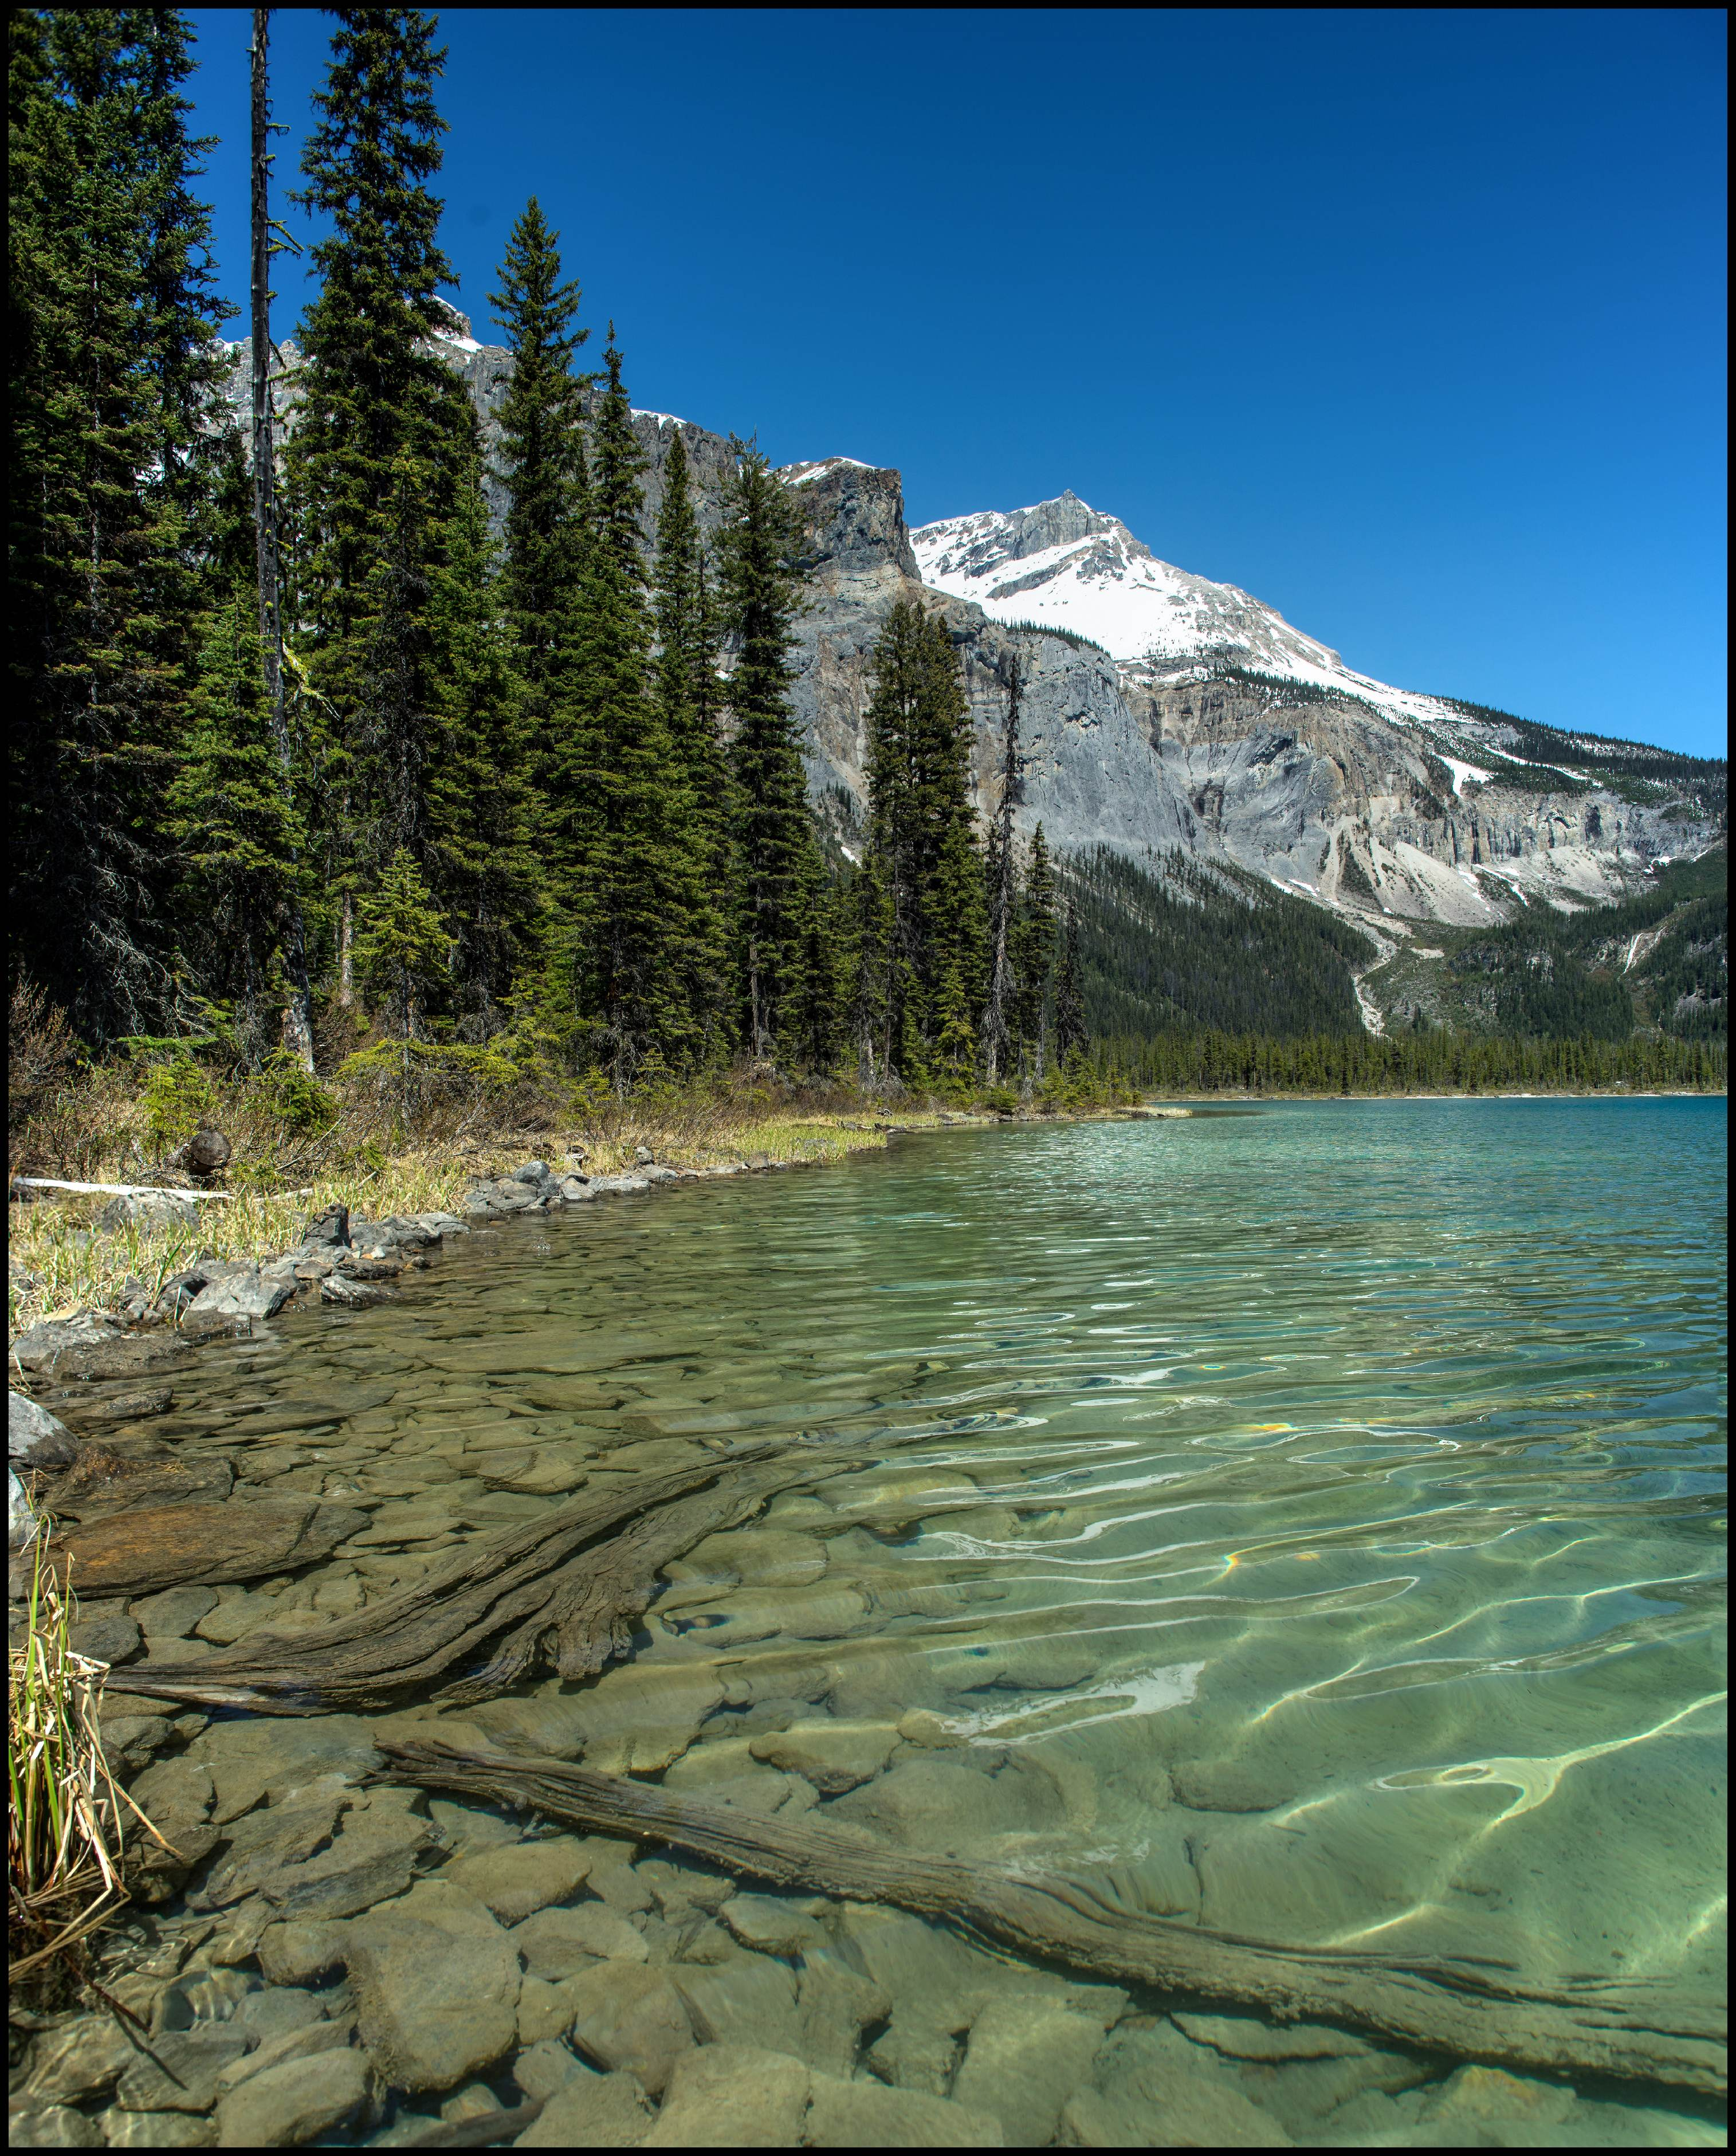 Emerald lake in Yoho National Park Sony A7 / Canon FD Tilt Shift 35 2.8